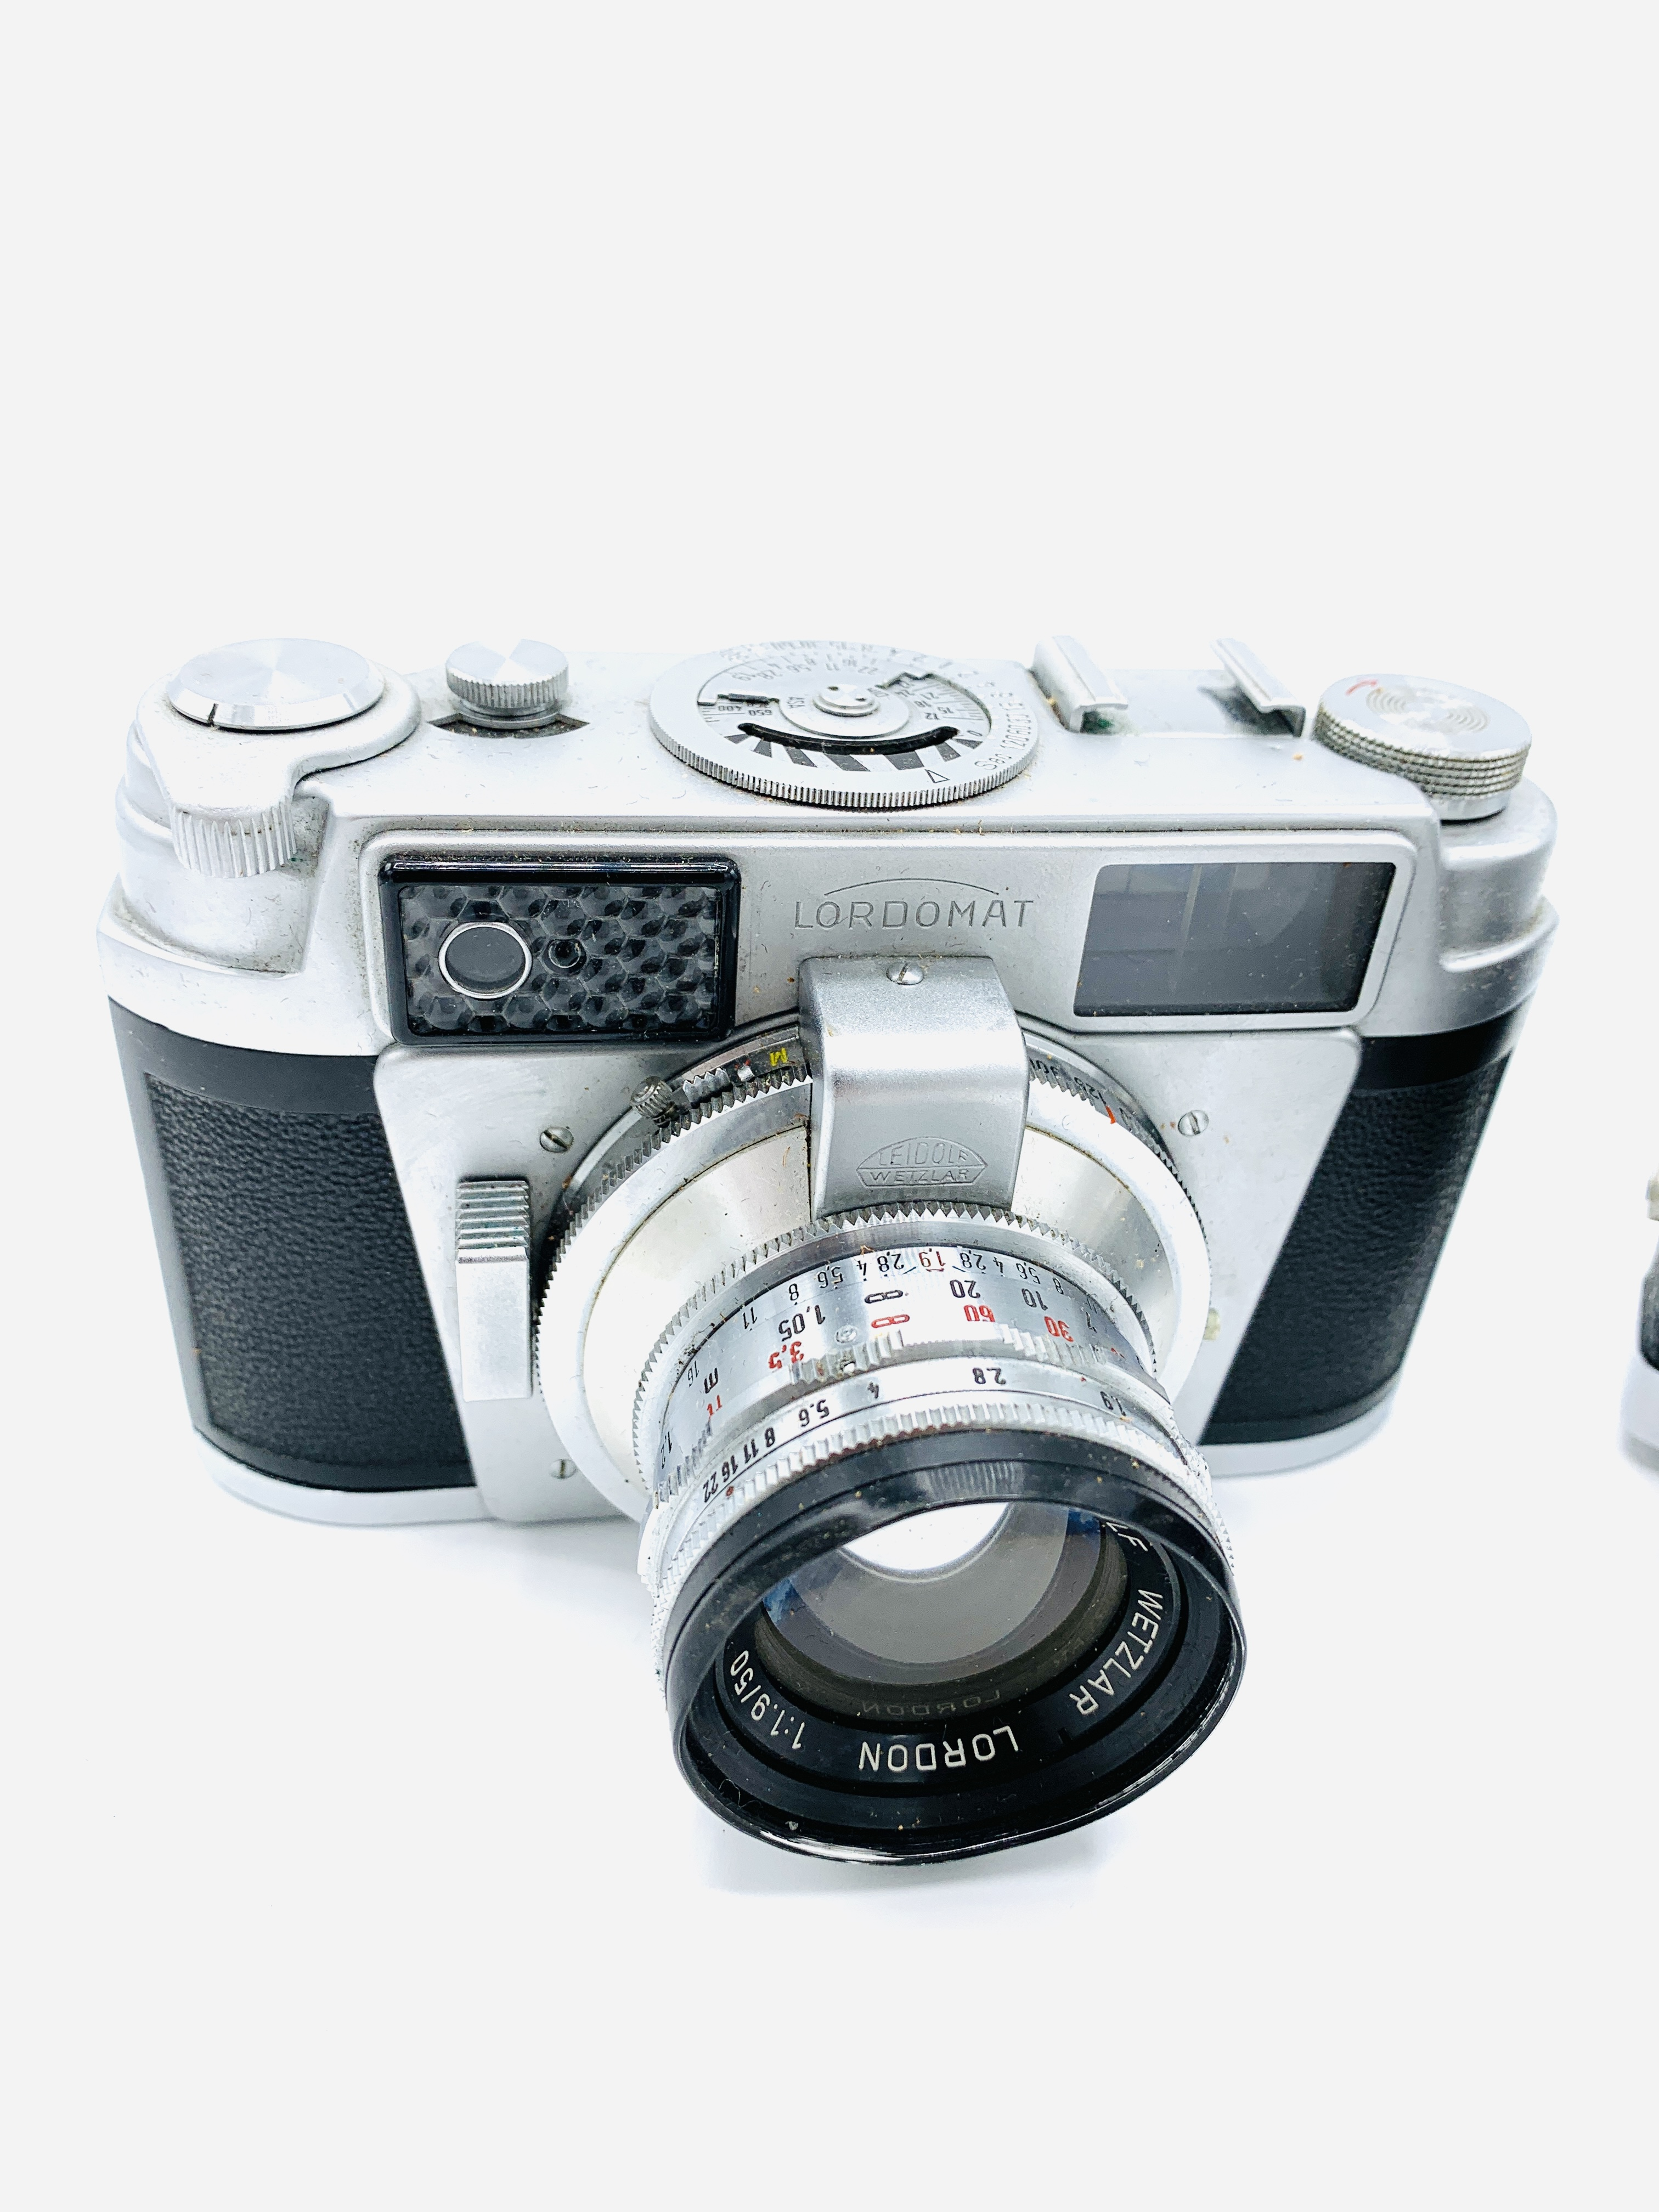 Leidolf, Wetzlar, Lordomat SLE camera, together with a Werra 1 camera - Image 2 of 4